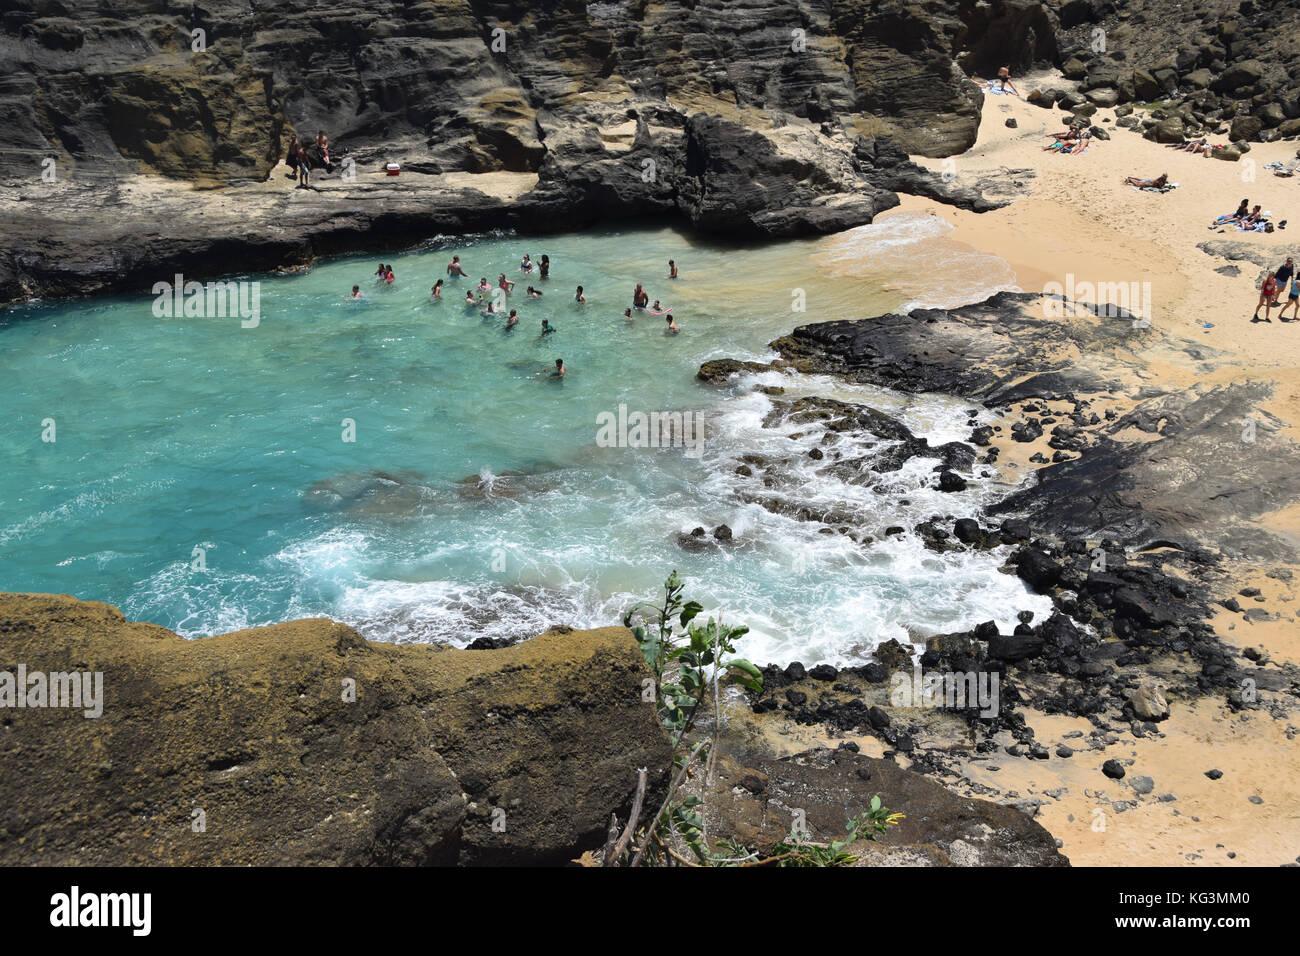 Halona Beach Cove - Oahu, Hawaii - Stock Image